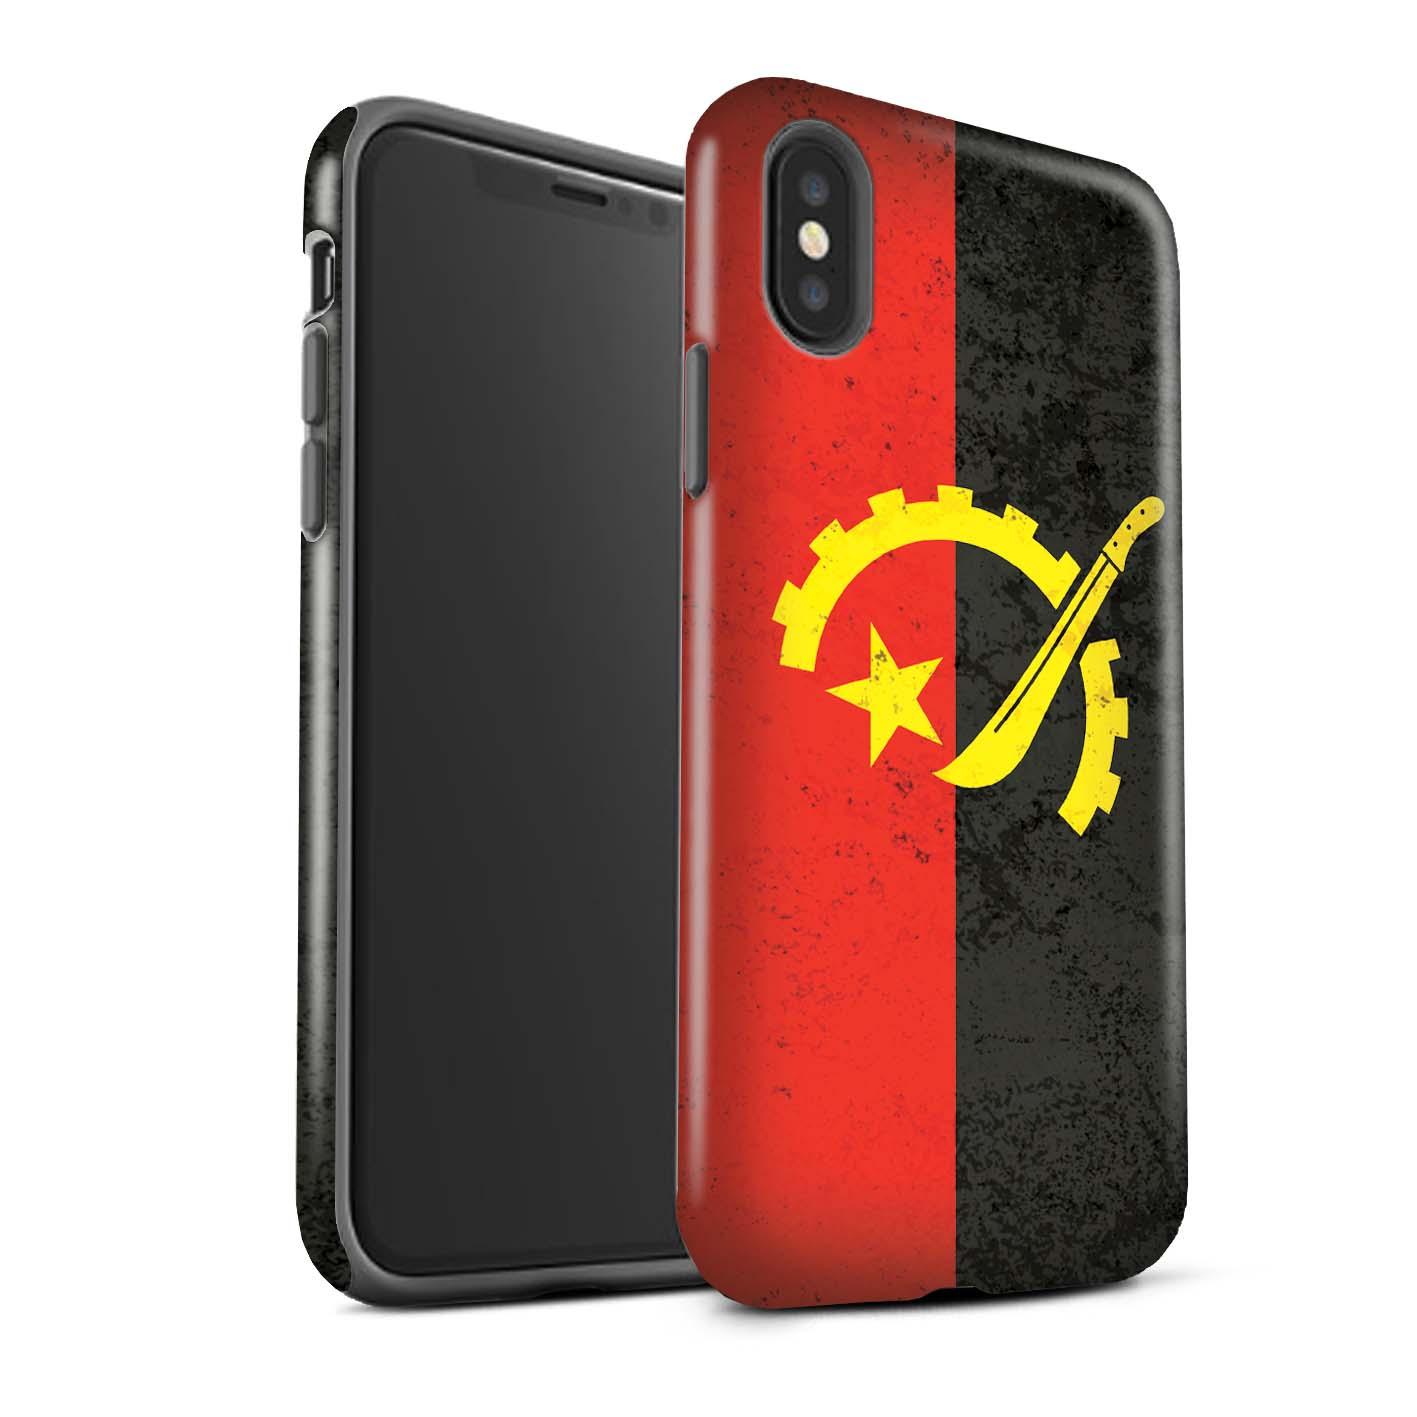 Personalised-Matte-Phone-Case-for-Apple-iPhone-XS-Max-Custom-Handwritten-Glitter